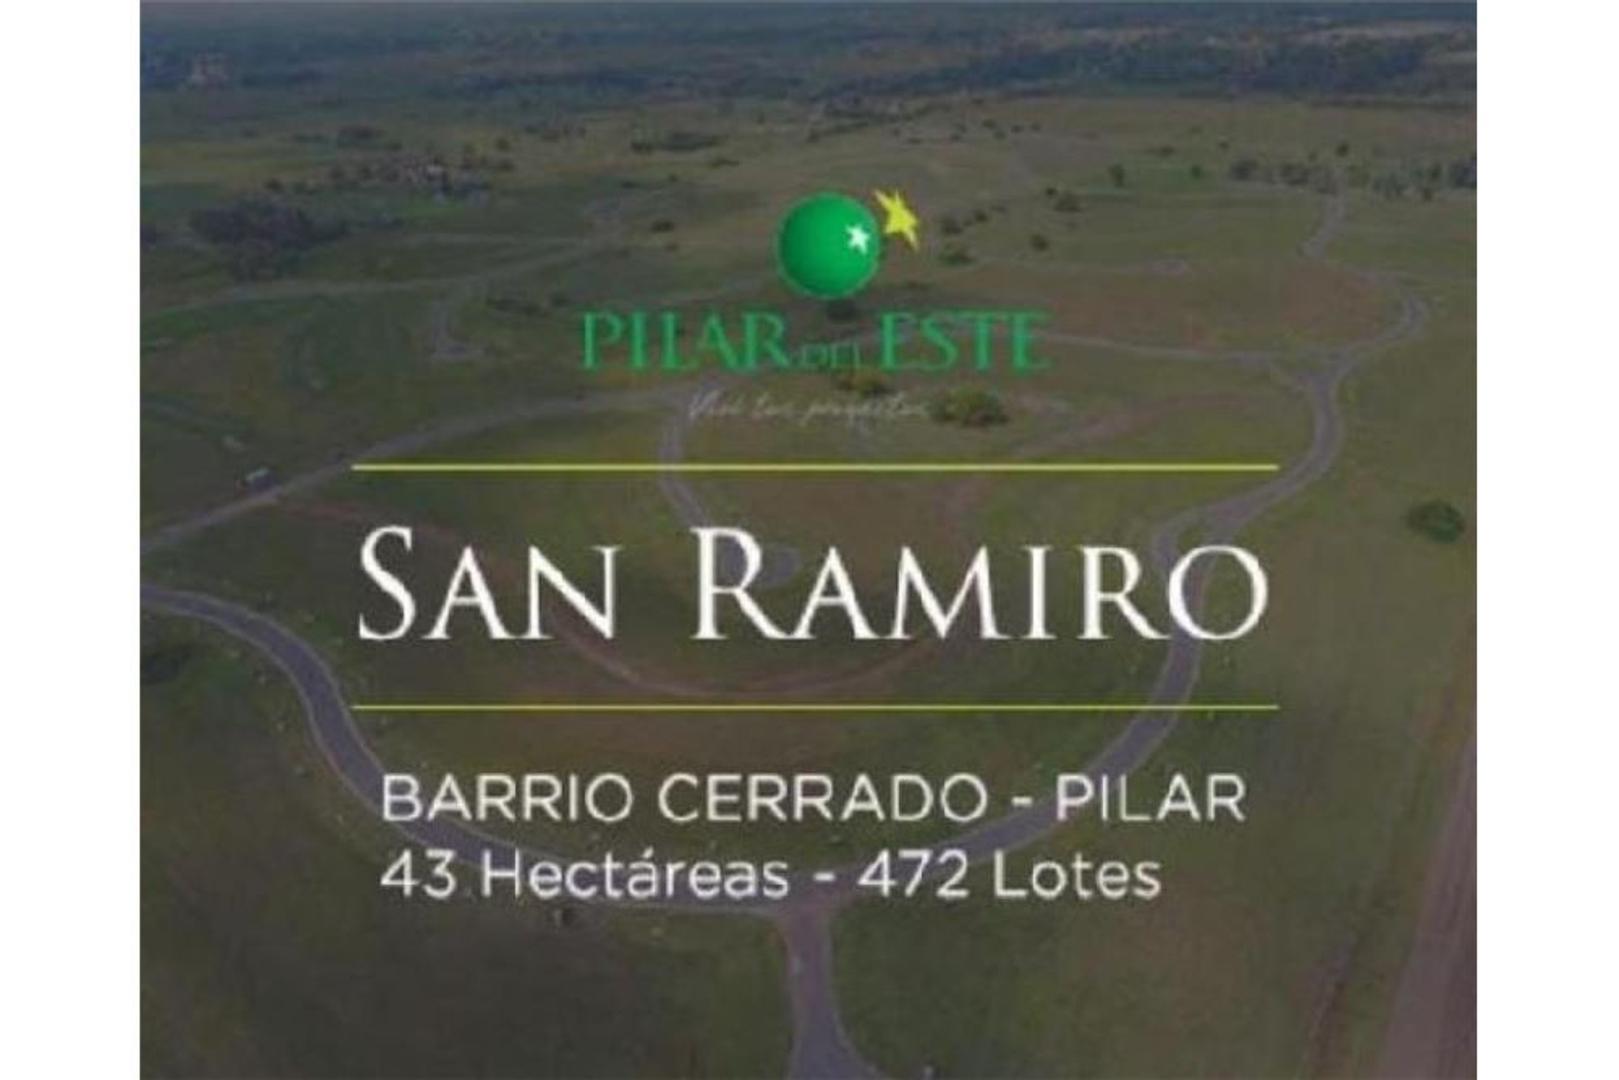 Lote Perimetral - Pilar del Este - San Ramiro